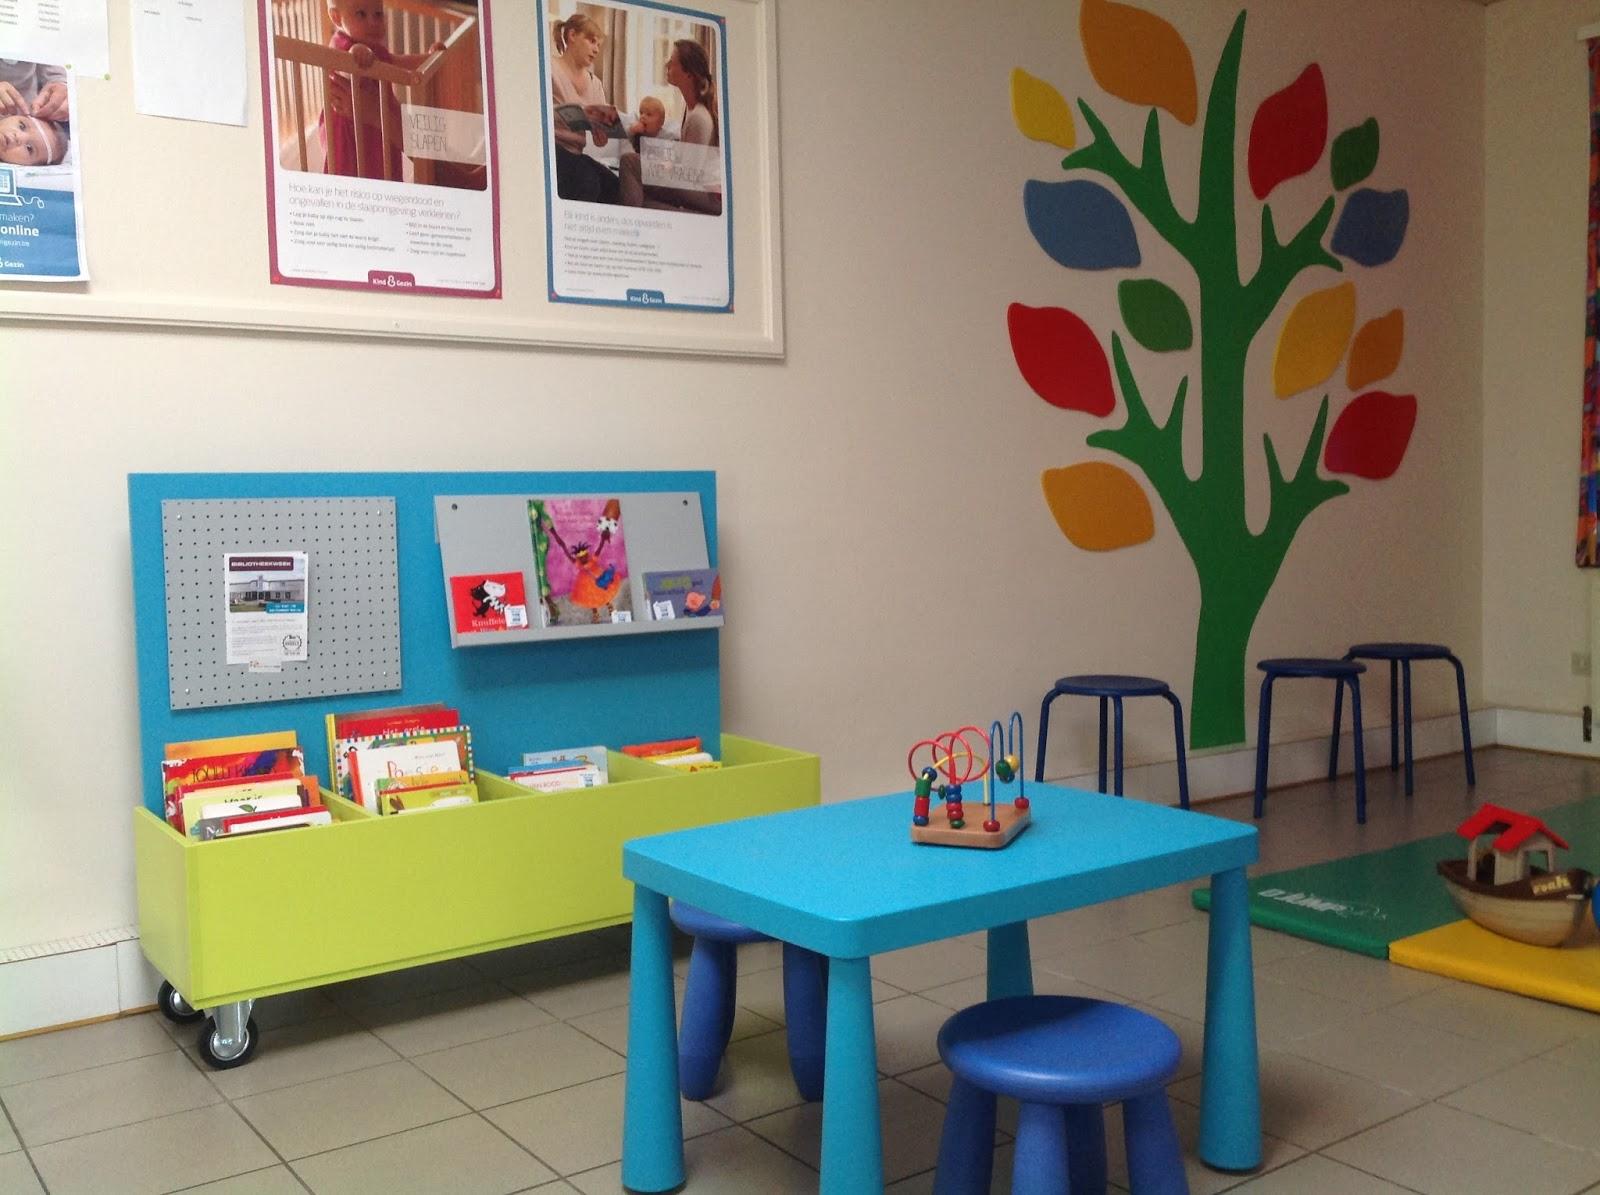 Bib kalmthout opent bibpunten in ocmw en huis van het kind bib kalmthout - Huis van kind buiten ...